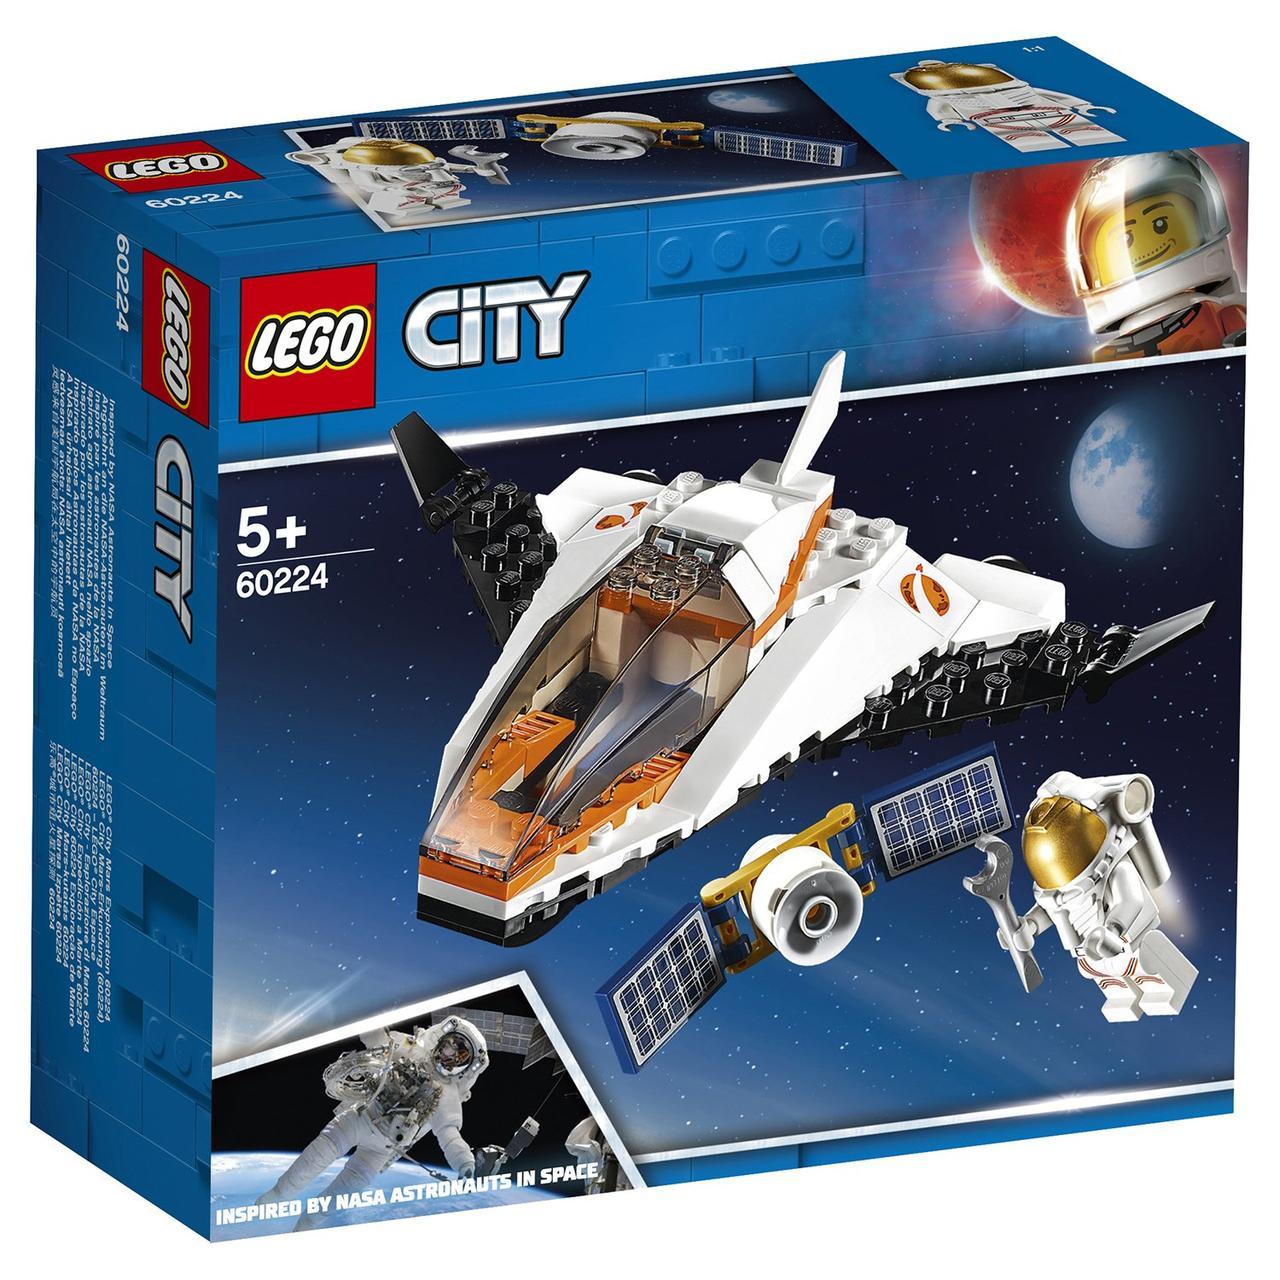 60224 Lego City Миссия по ремонту спутника, Лего Город Сити